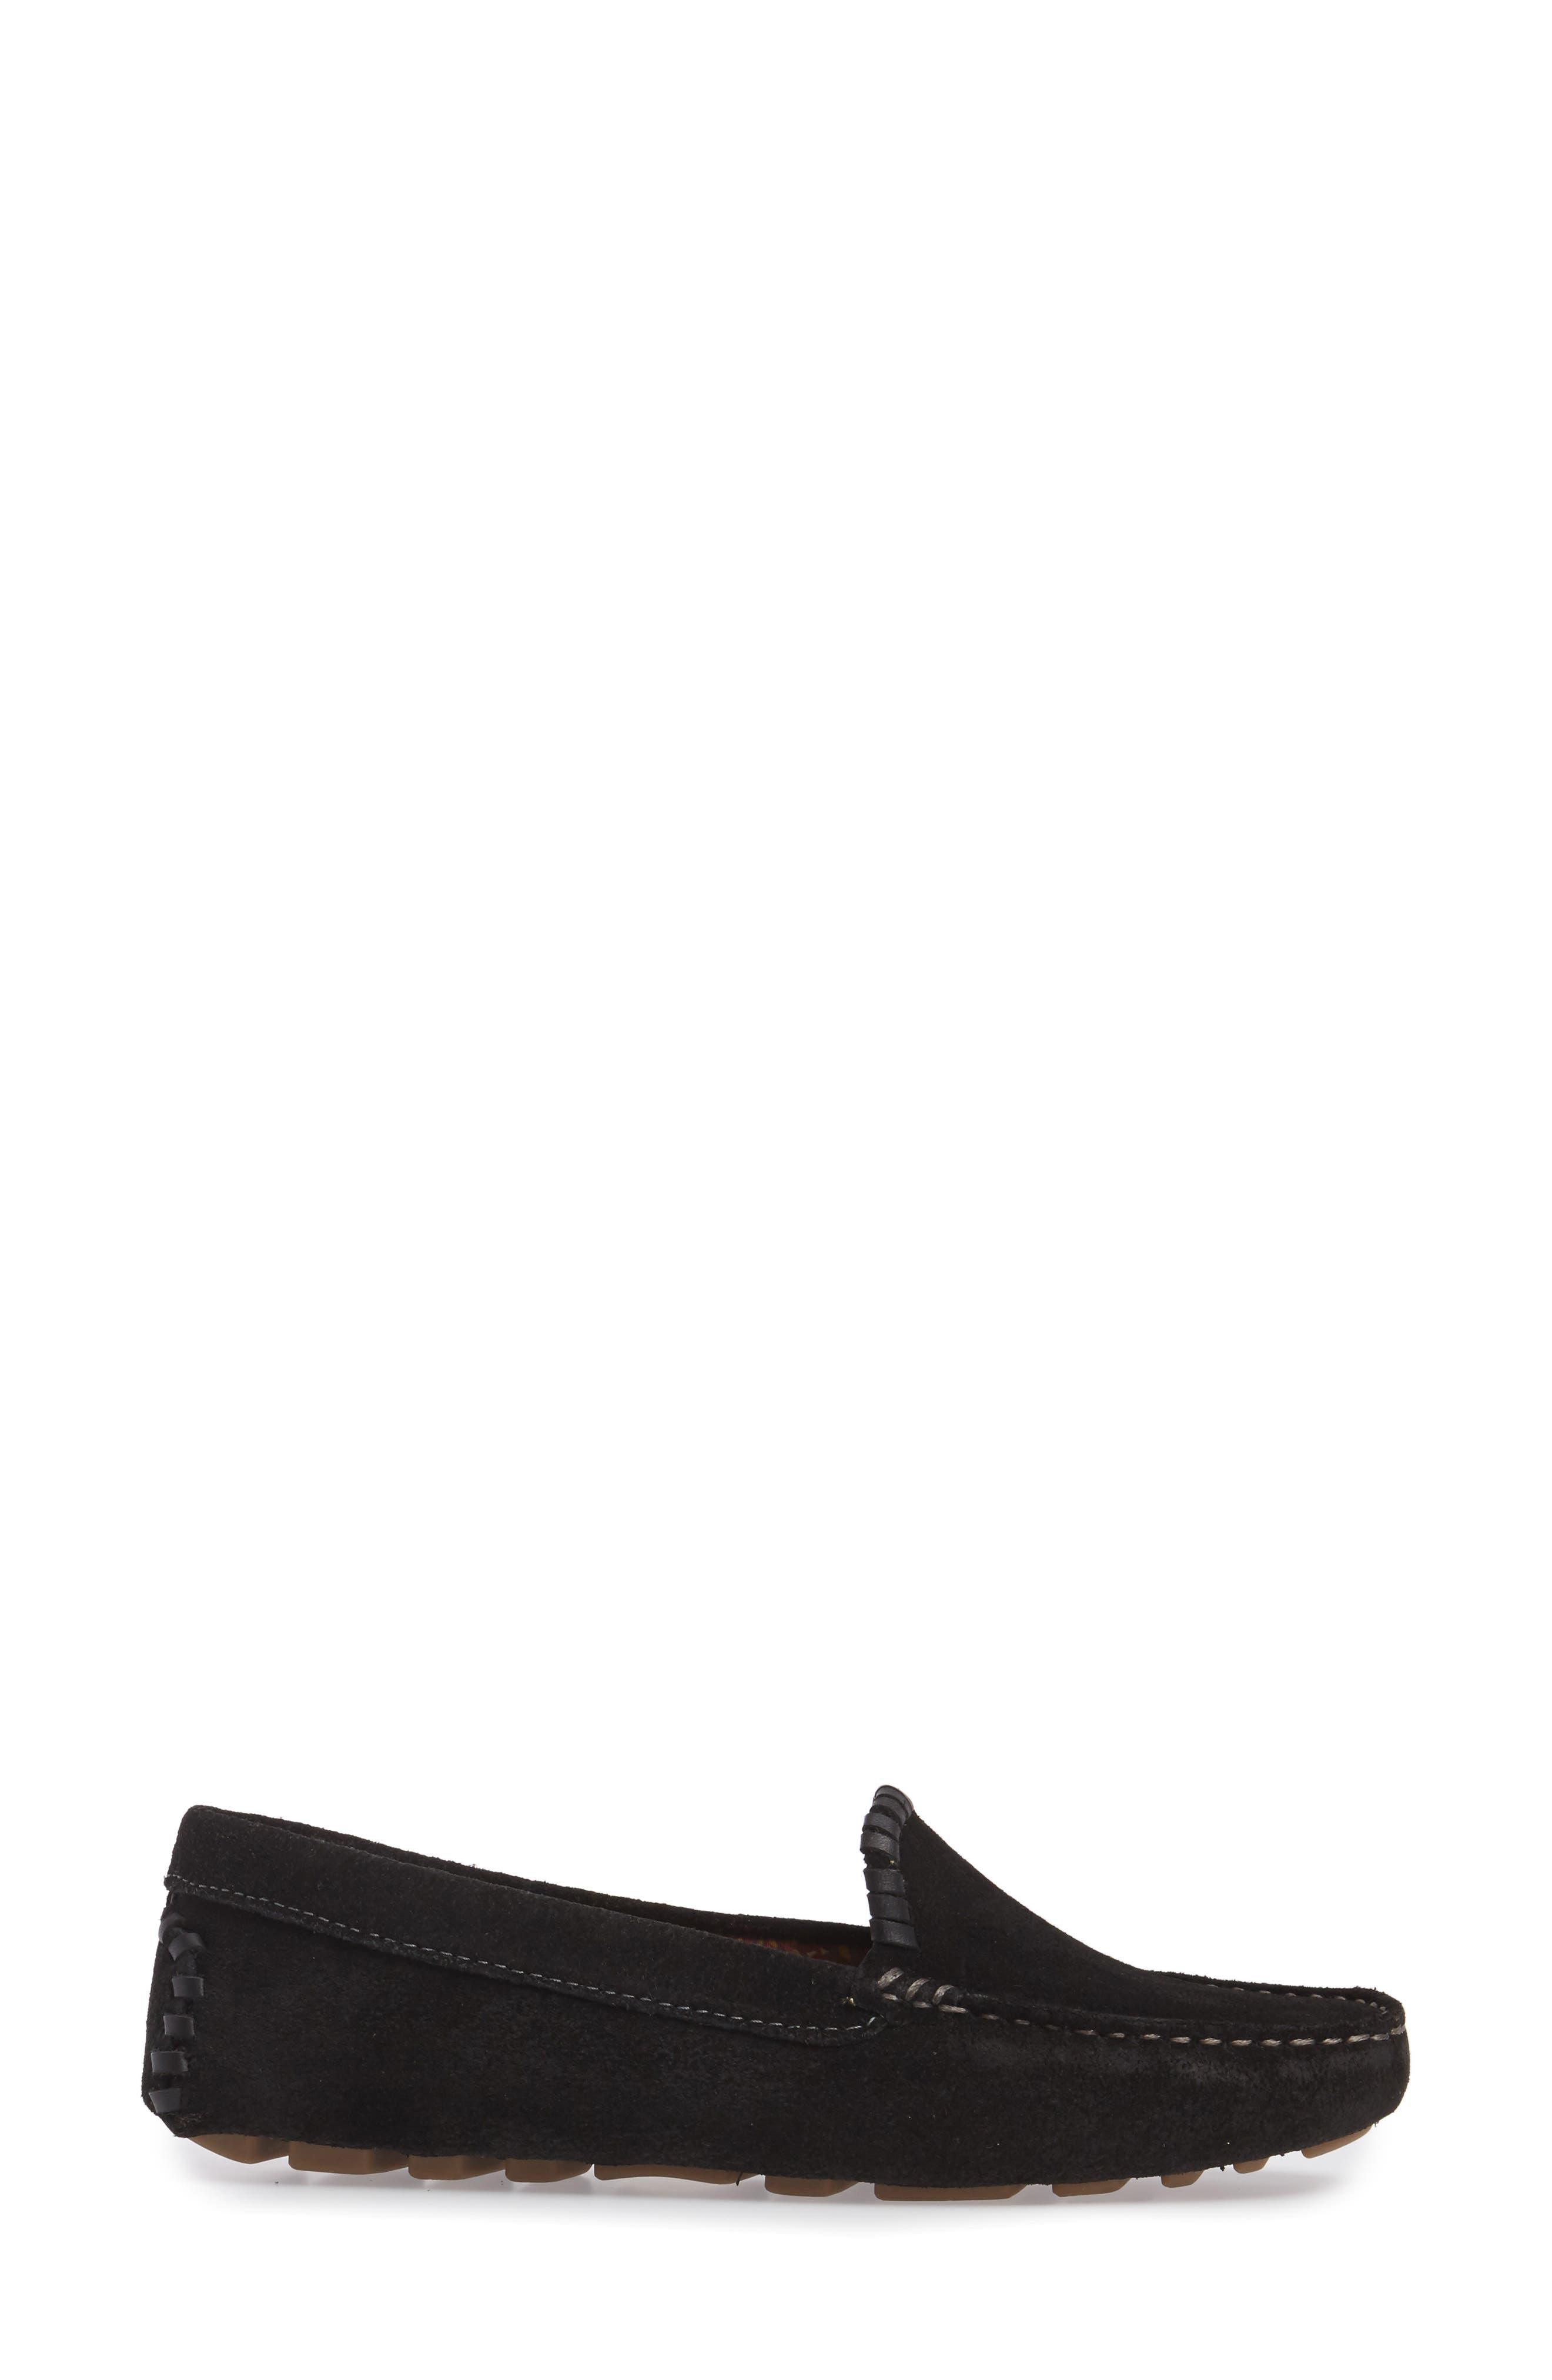 Taylor Driving Loafer,                             Alternate thumbnail 3, color,                             BLACK SUEDE